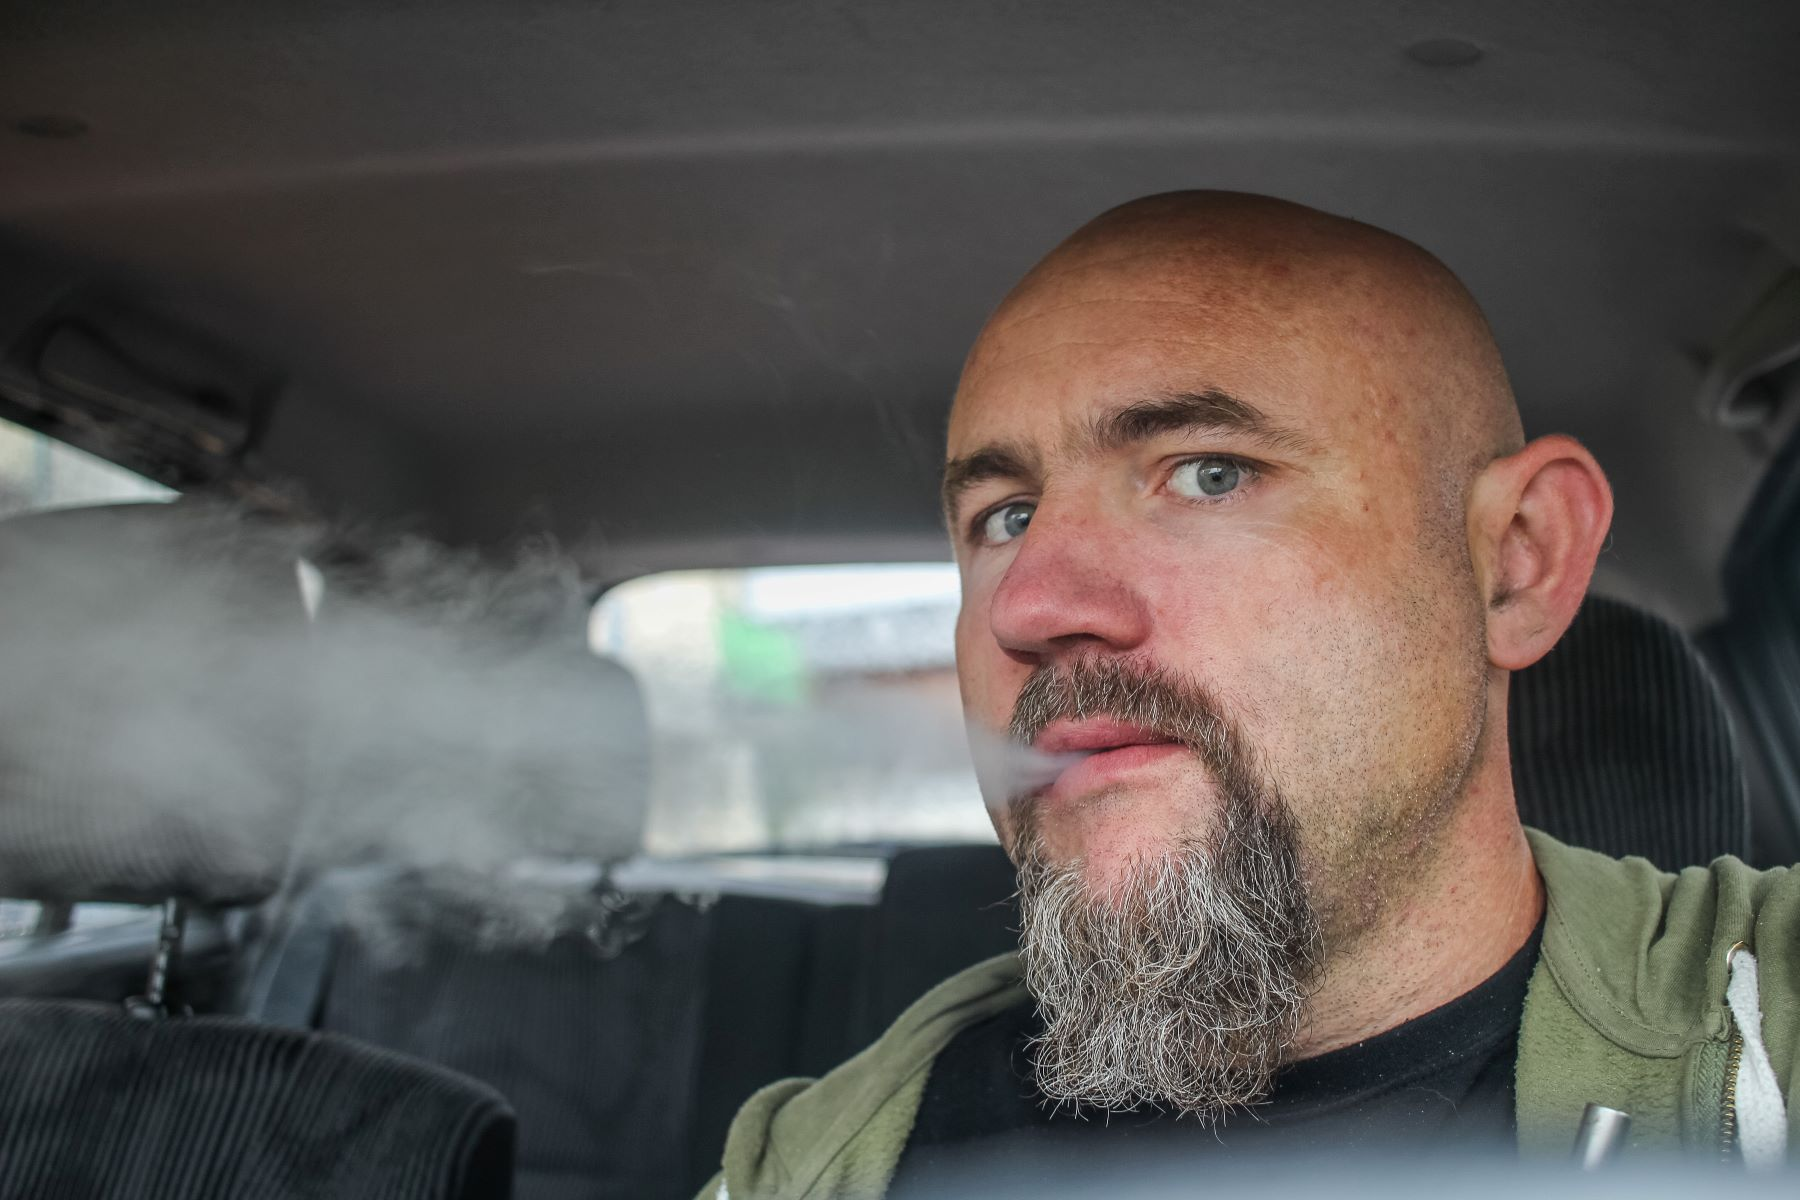 A man smoking in a car in Gdansk, Poland